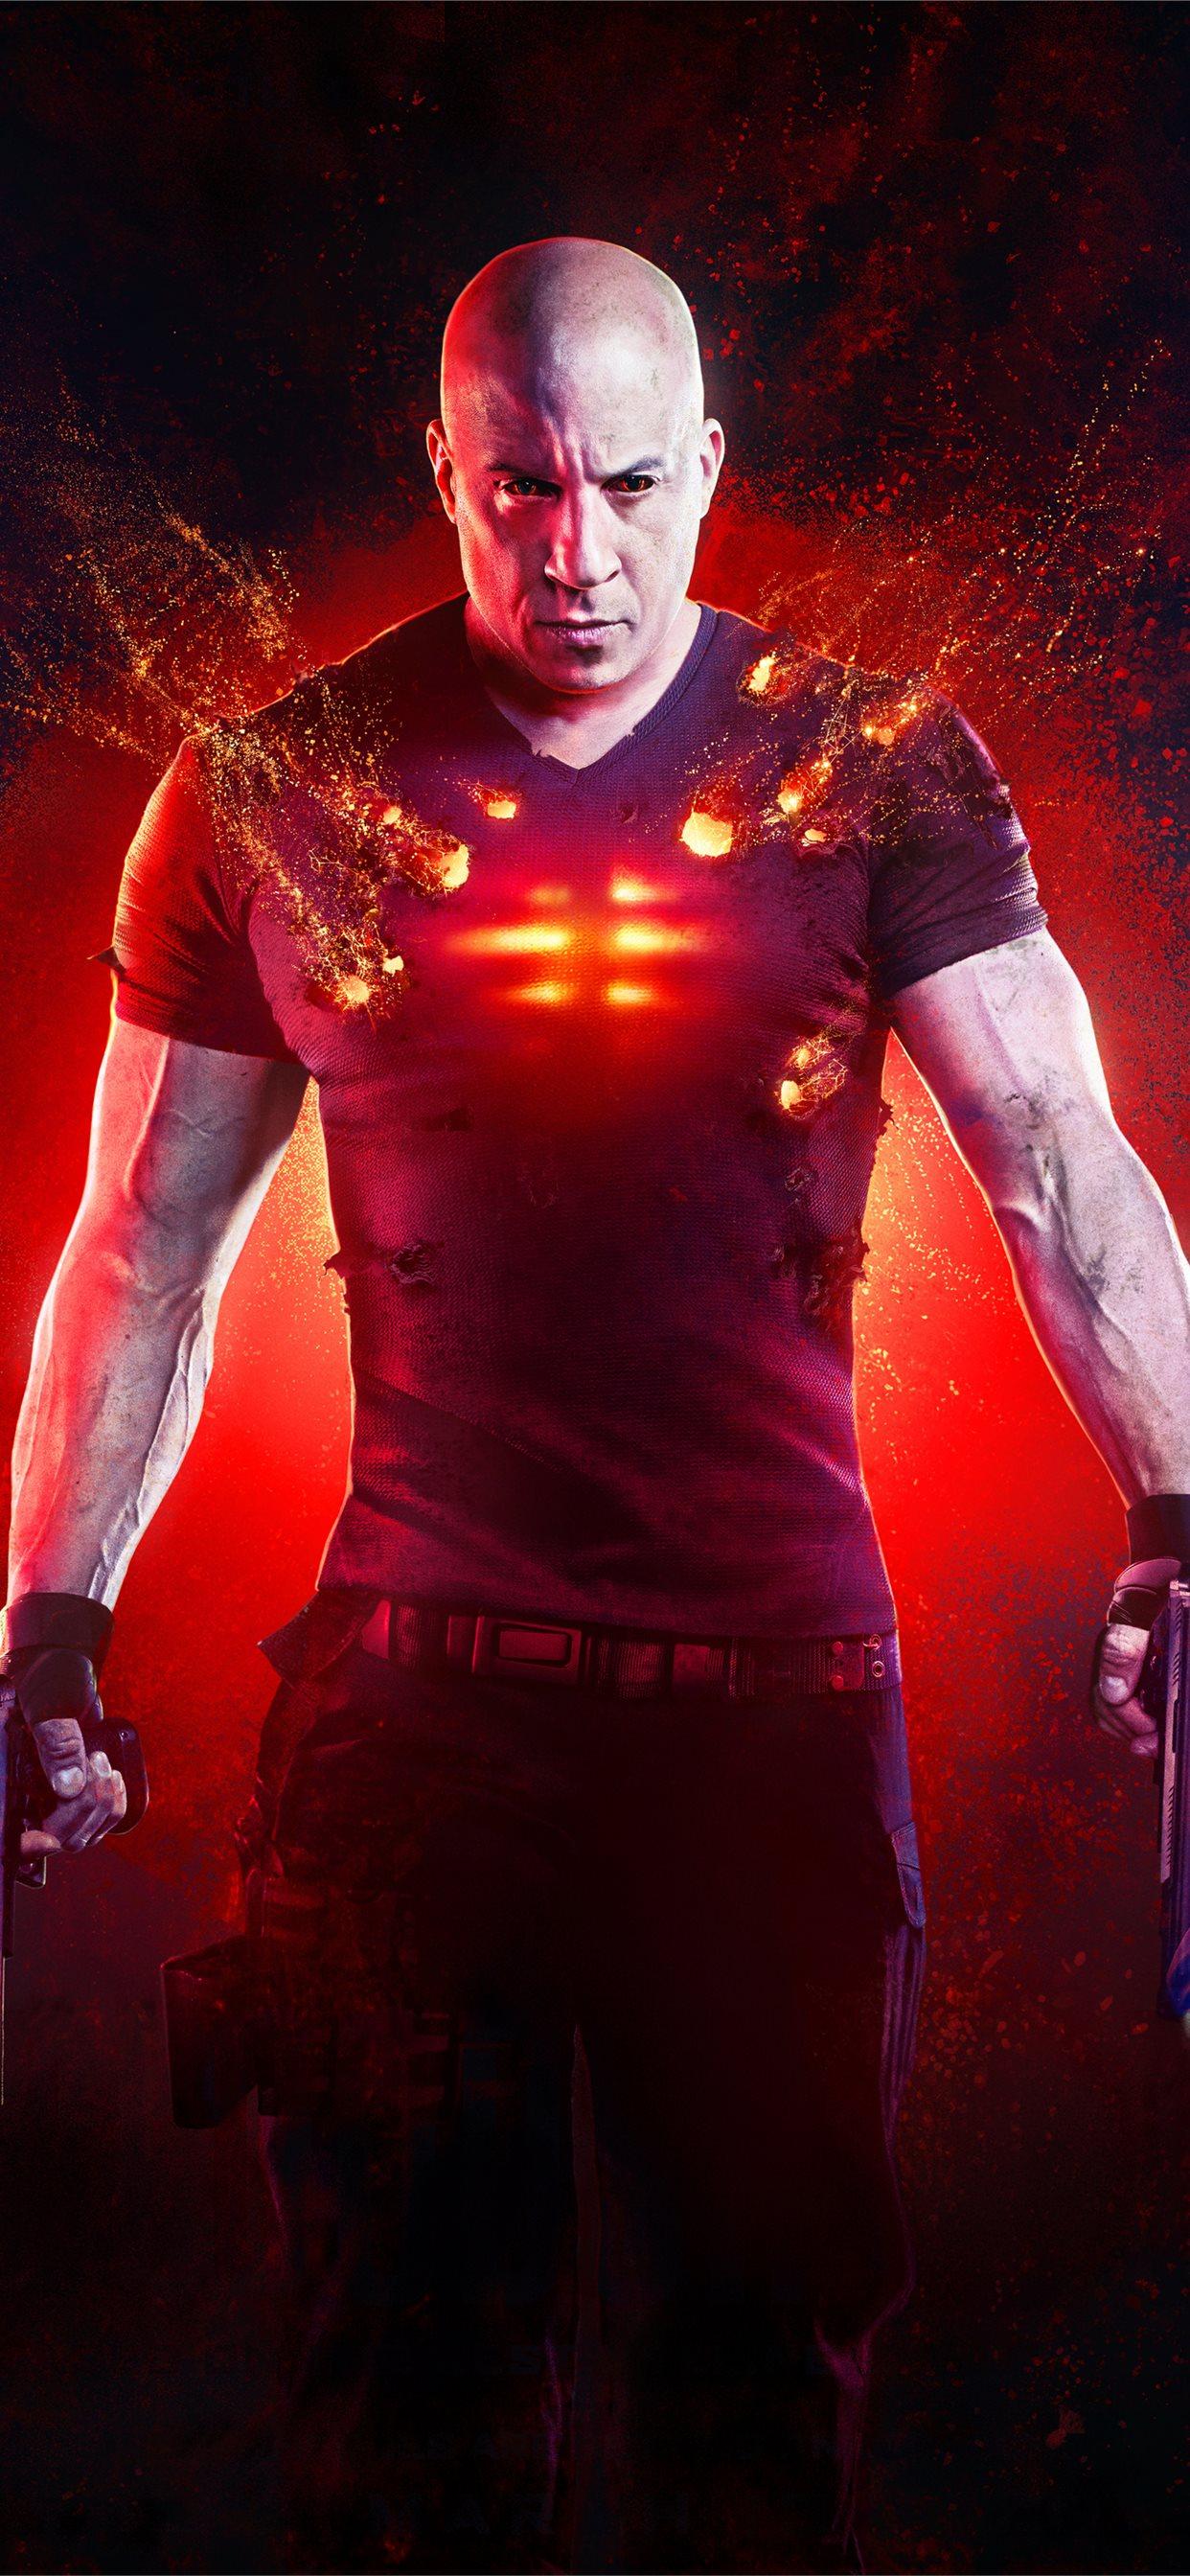 bloodshot movie 2020 5k vin diesel iPhone Wallpapers Download 1242x2688